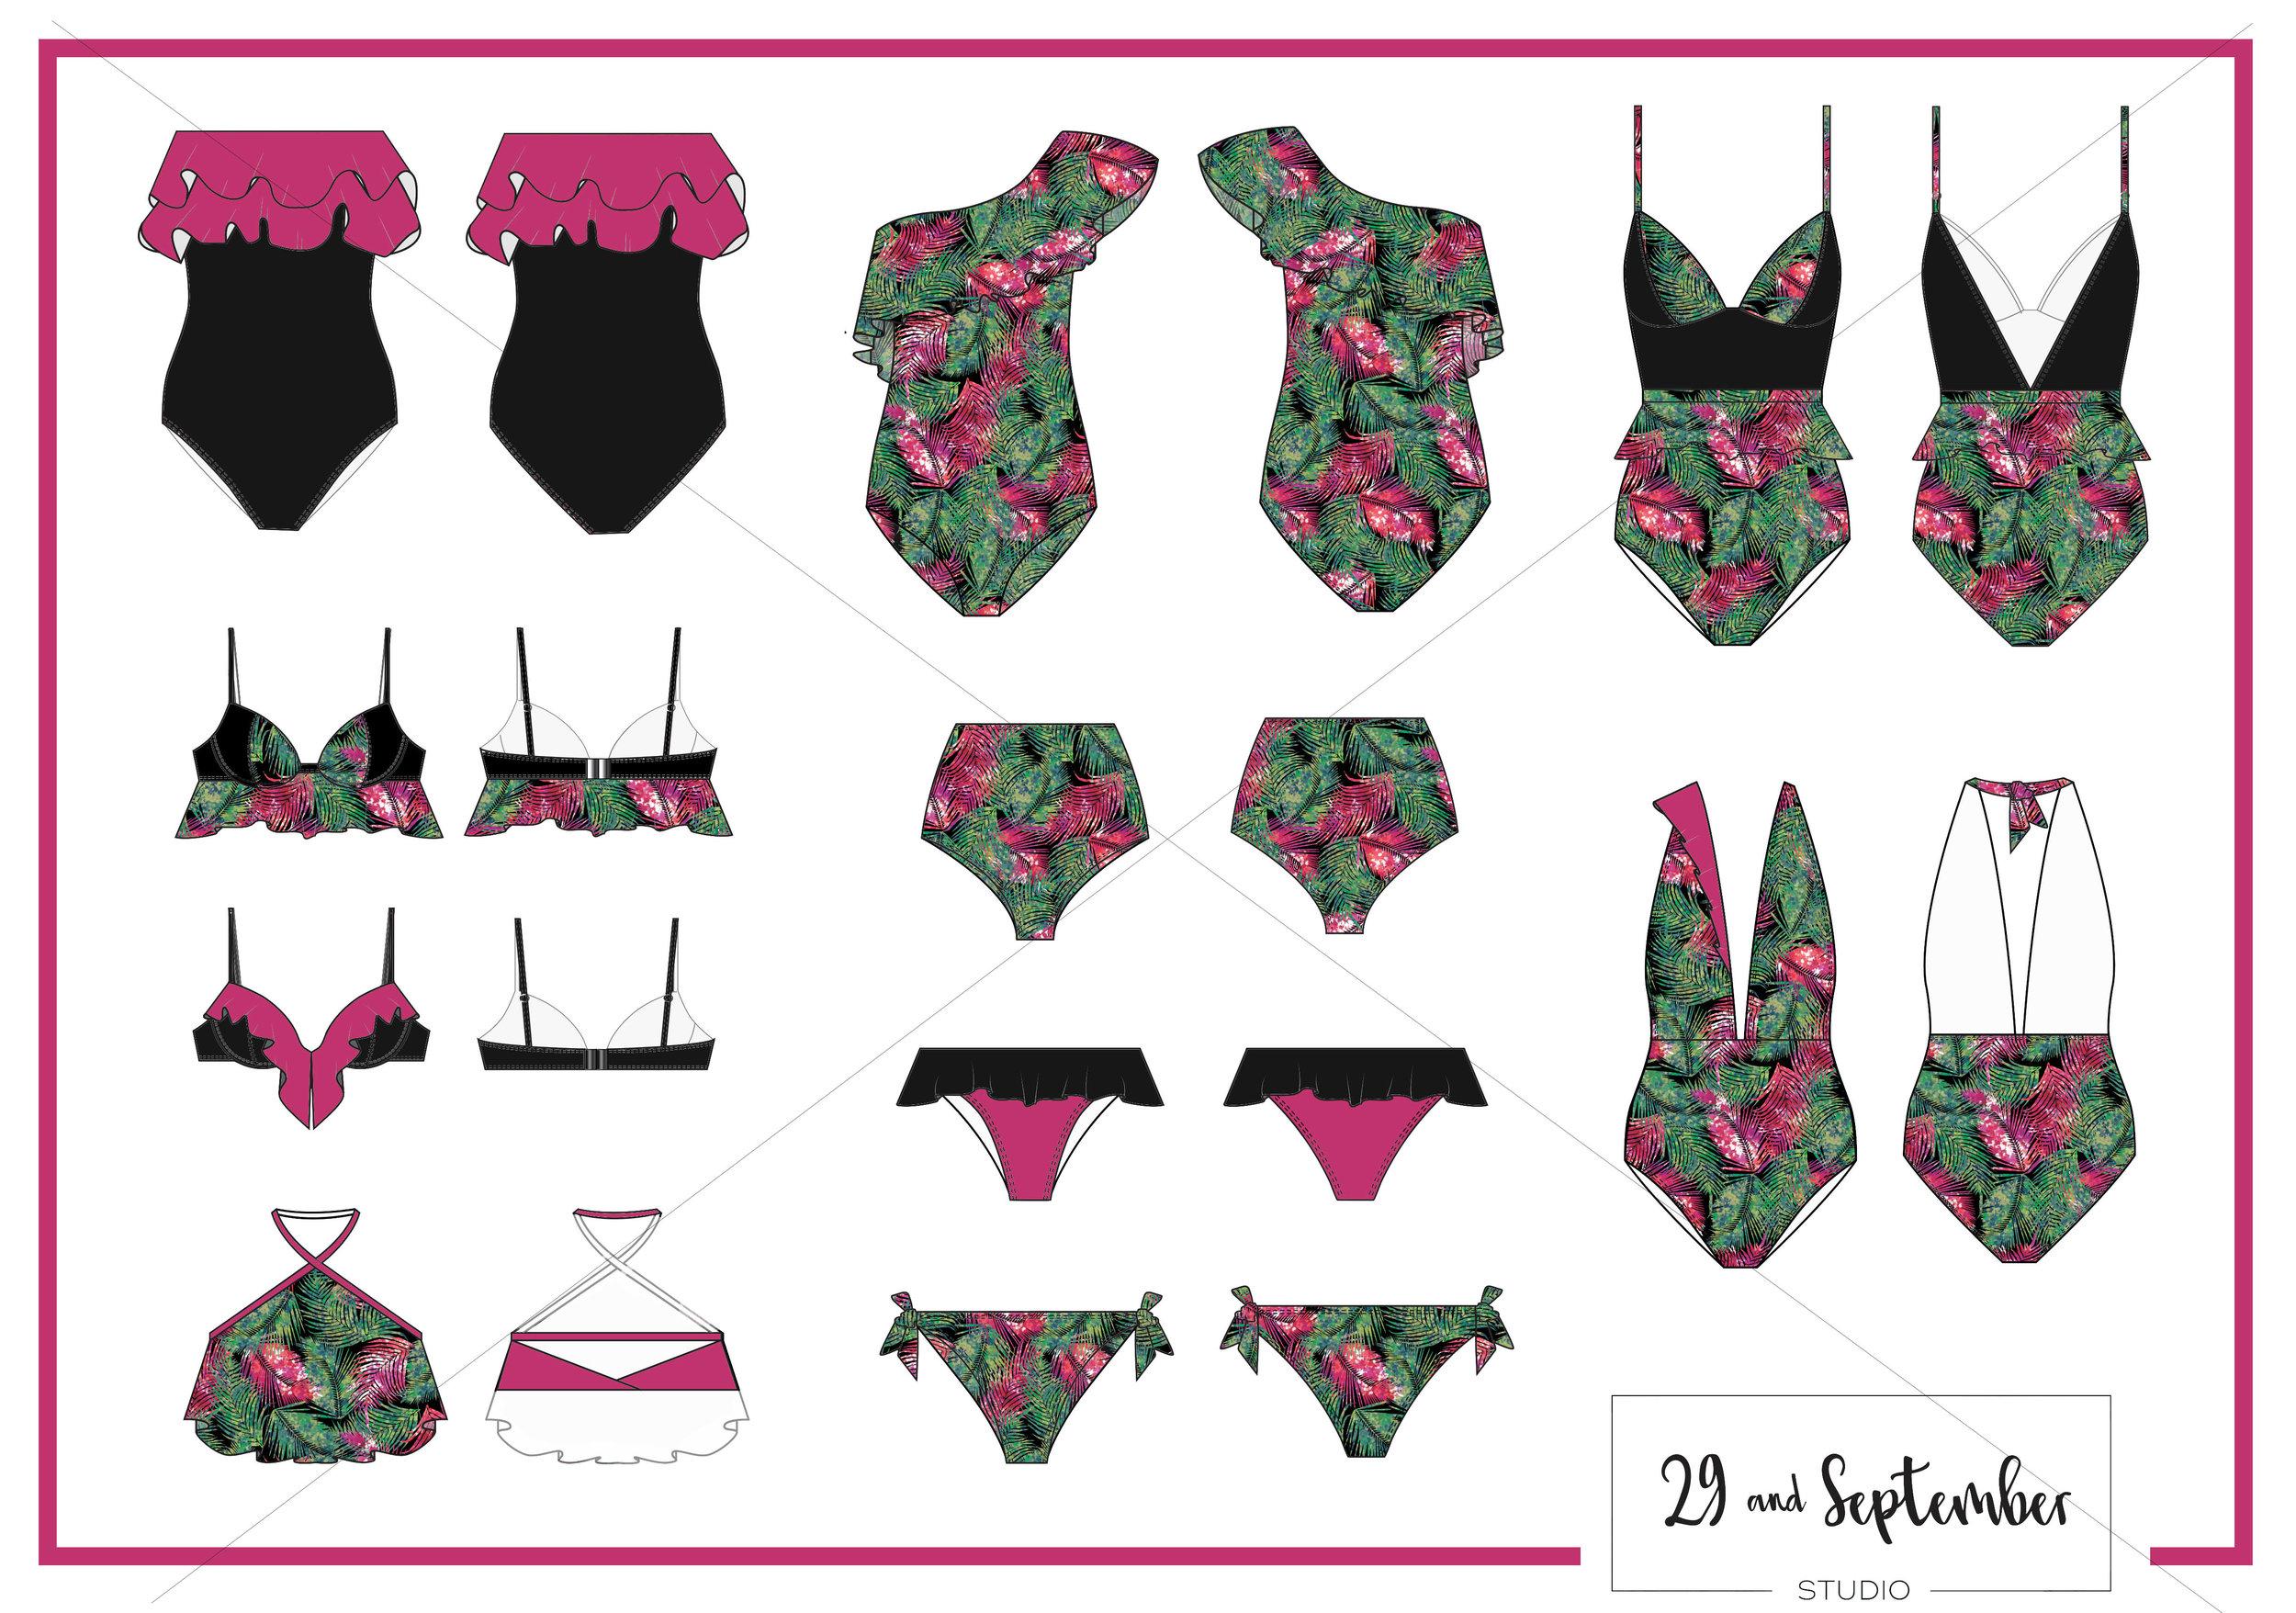 Swimwear designs, technical drawings + print designs by 29andSeptember Studio